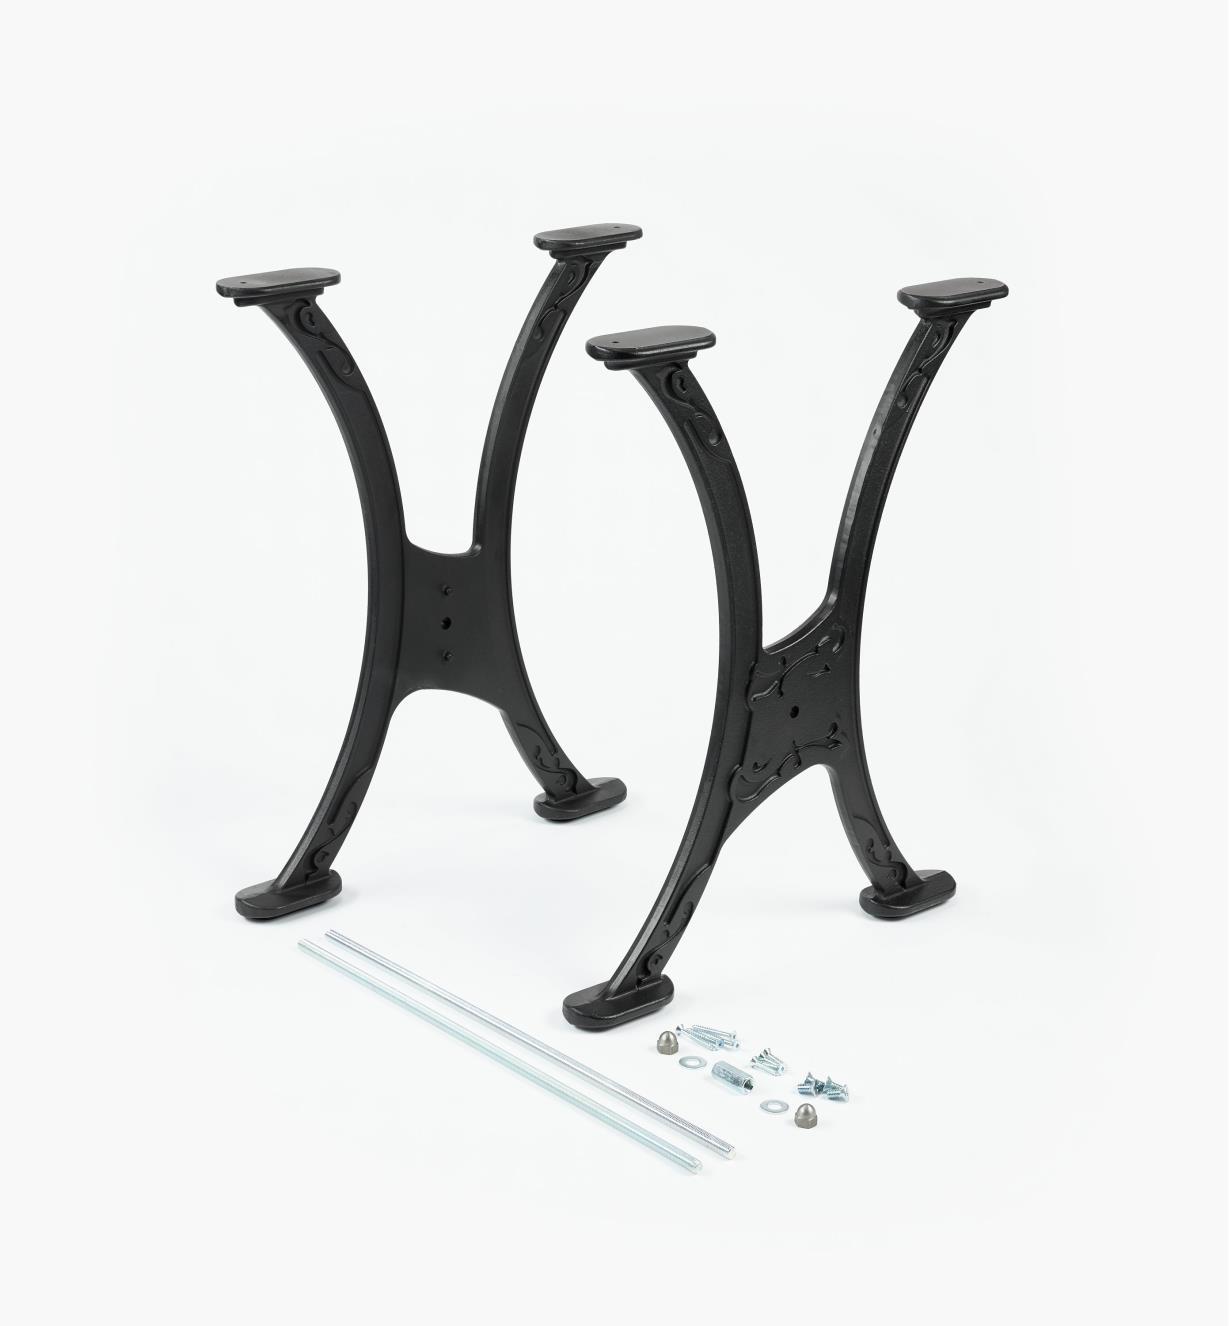 Cast Iron Legs Lee Valley Tools